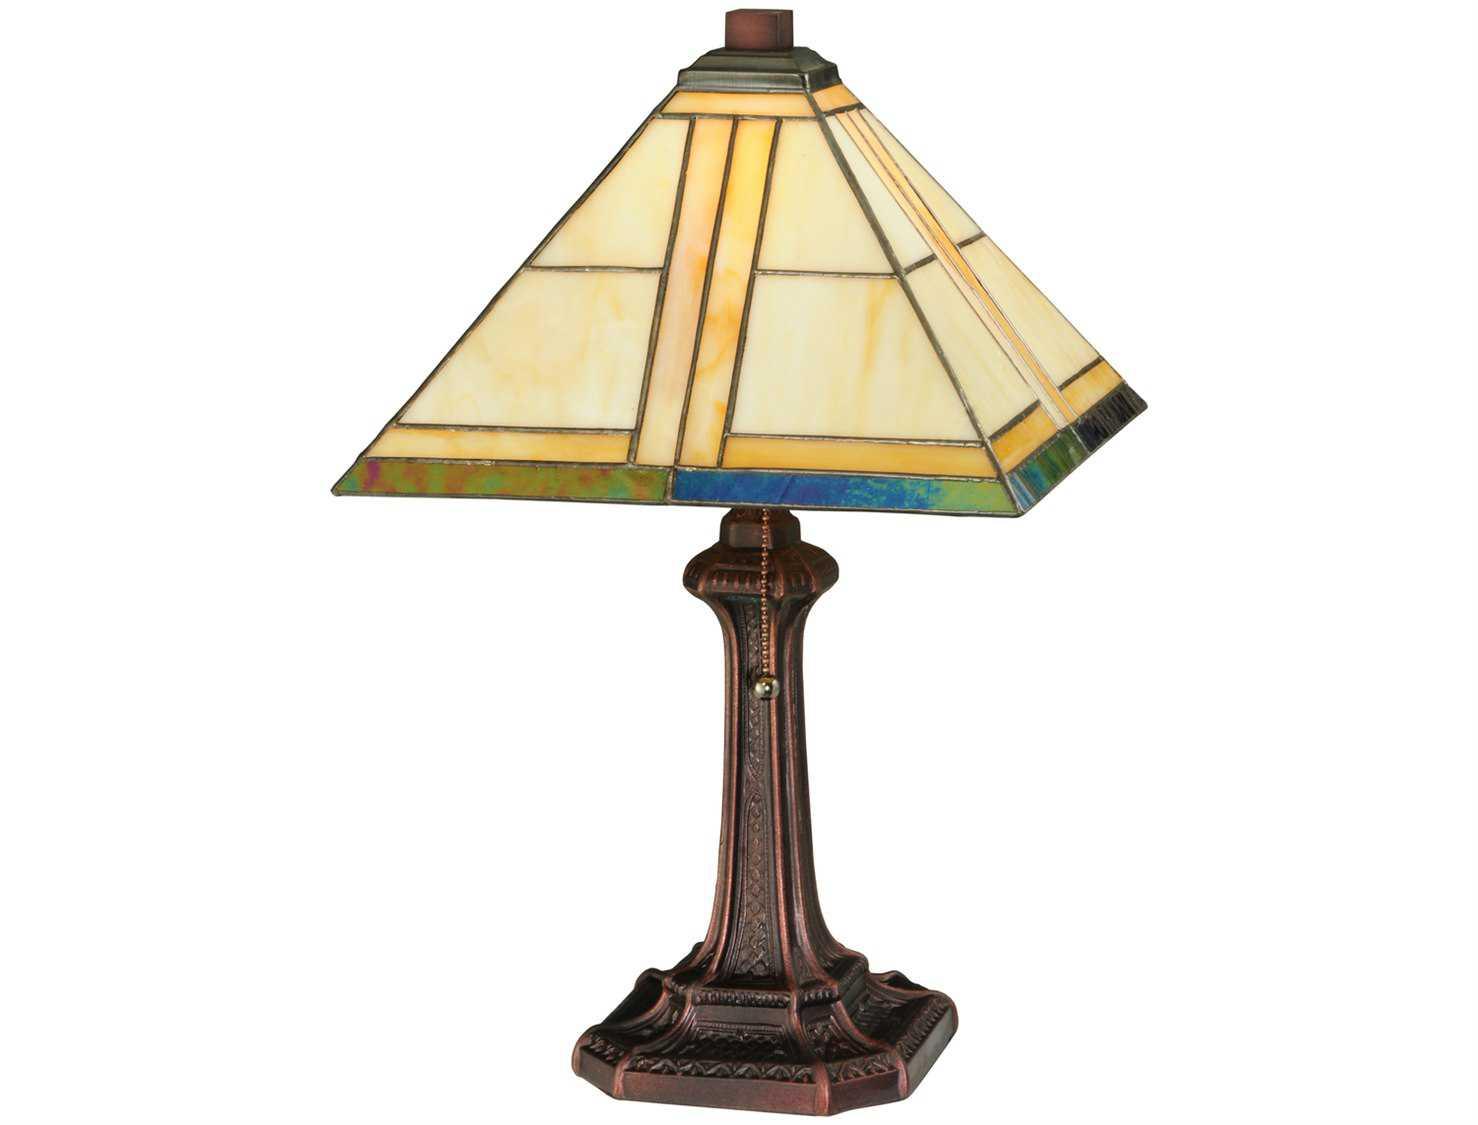 meyda tiffany trellis multi color table lamp 127917. Black Bedroom Furniture Sets. Home Design Ideas